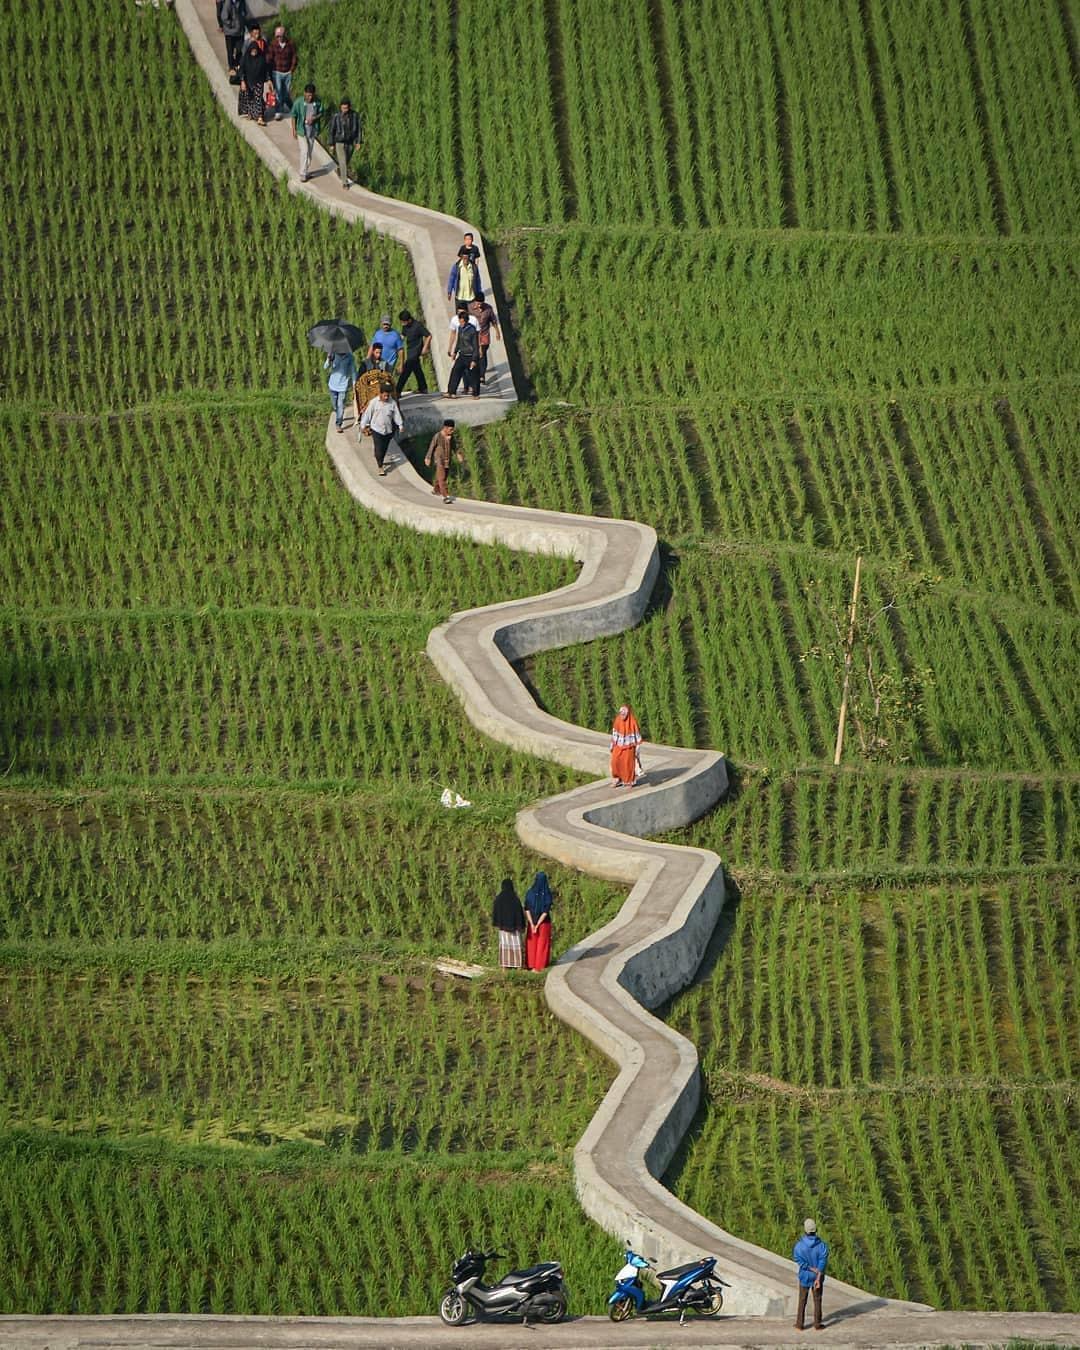 Objek Wisata Jalan di Ngarai Sianok Bukit Tinggi Sumatera Barat